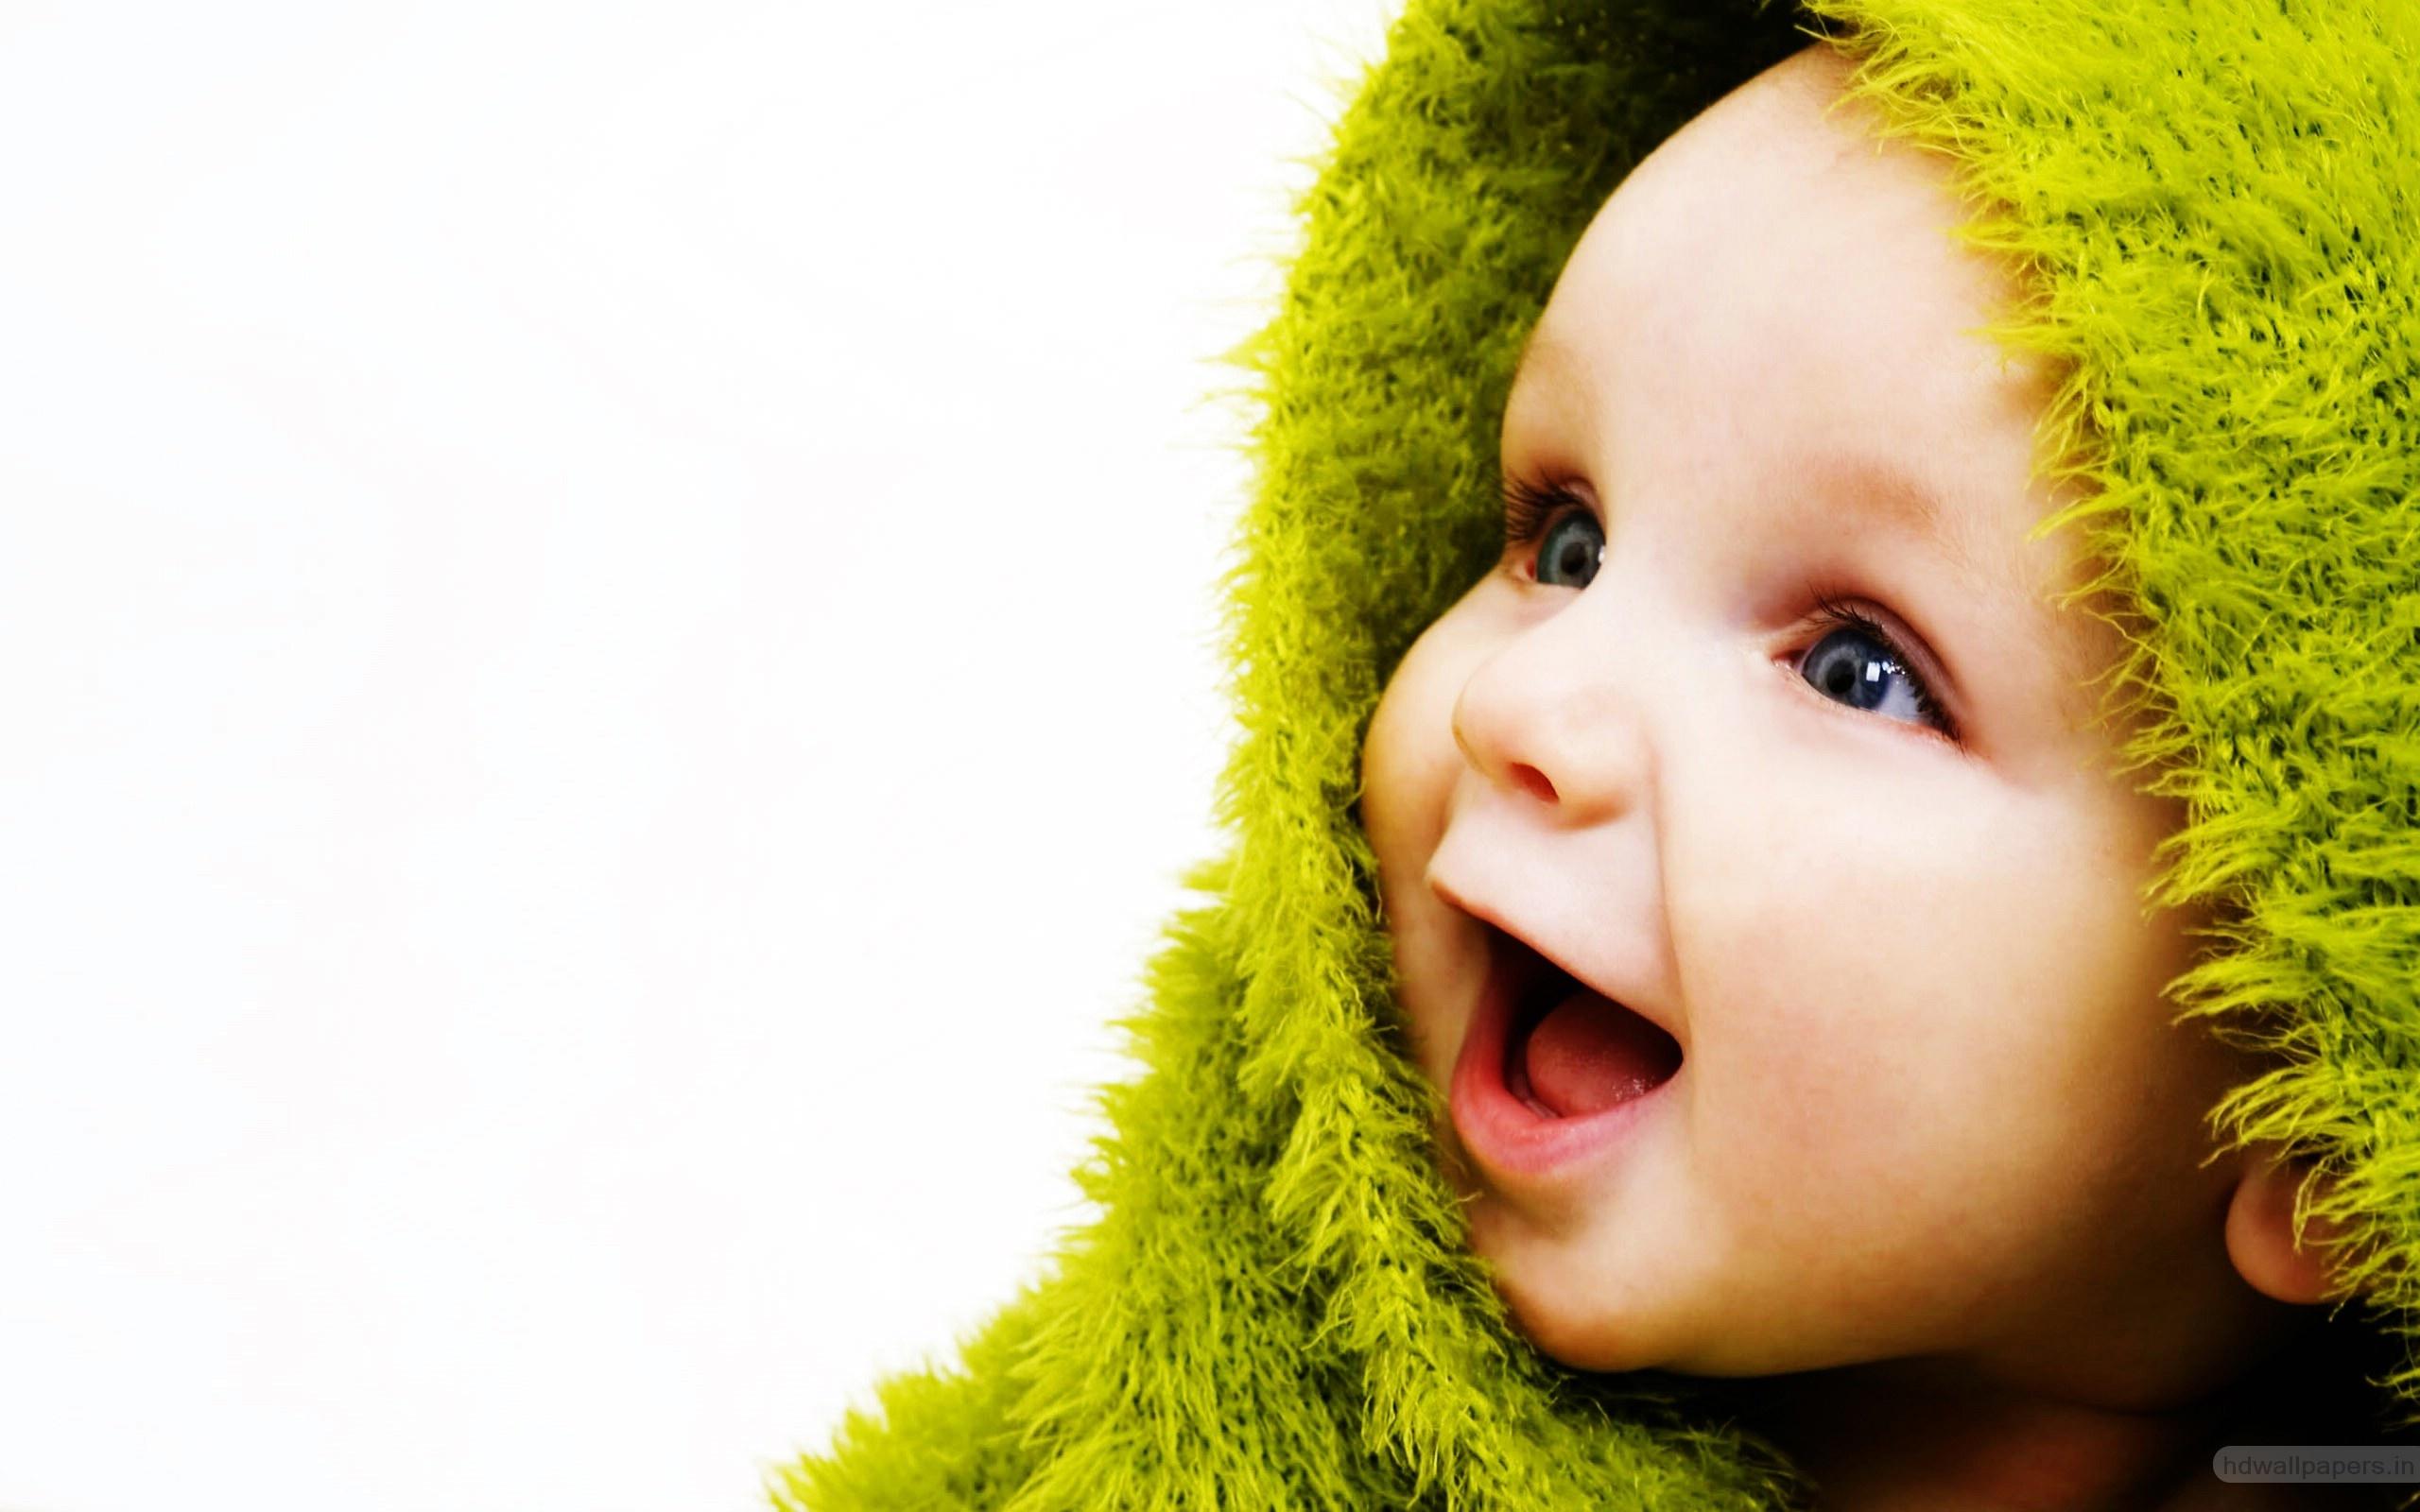 Cute Baby Boy Green Eyes Wallpapers   HD Wallpapers   ID